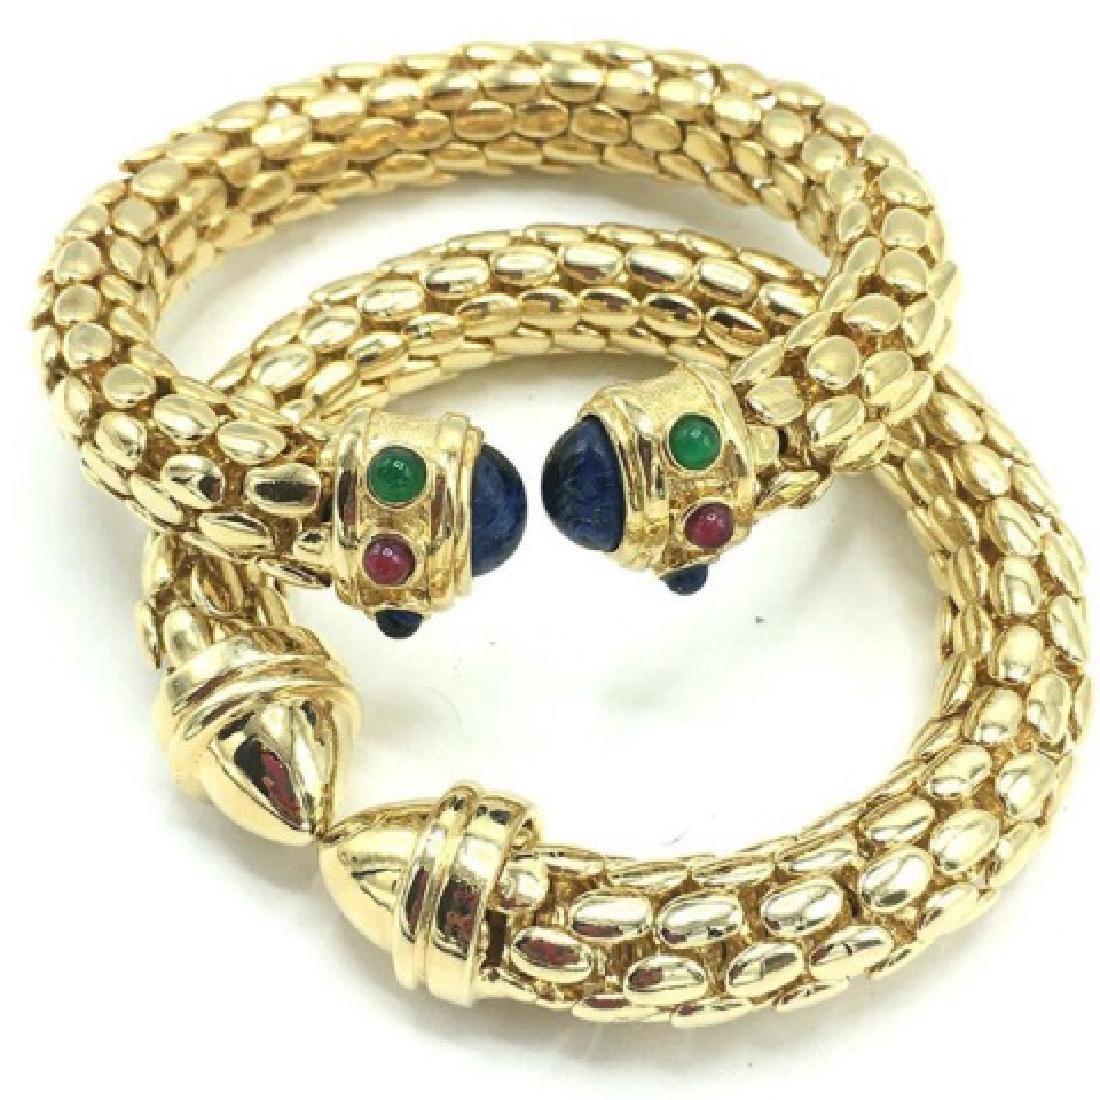 Pair of Costume Cuff Bracelets w/ Faux Gems